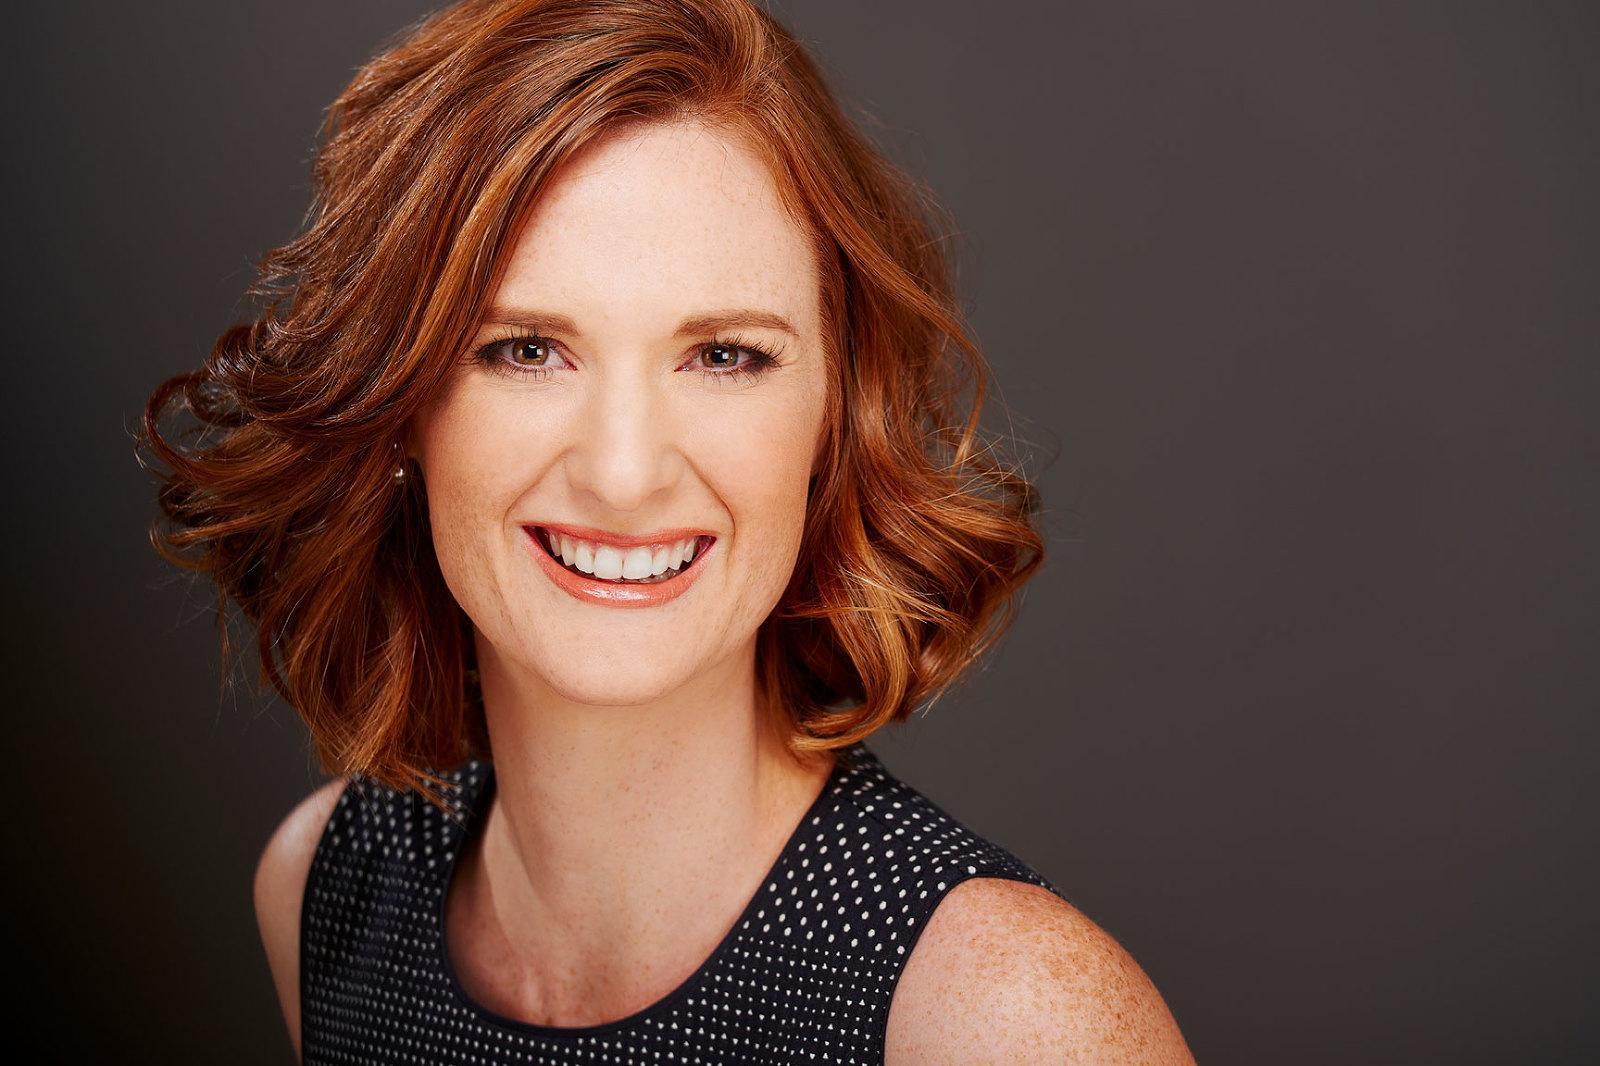 LinkedIn Headshots for women